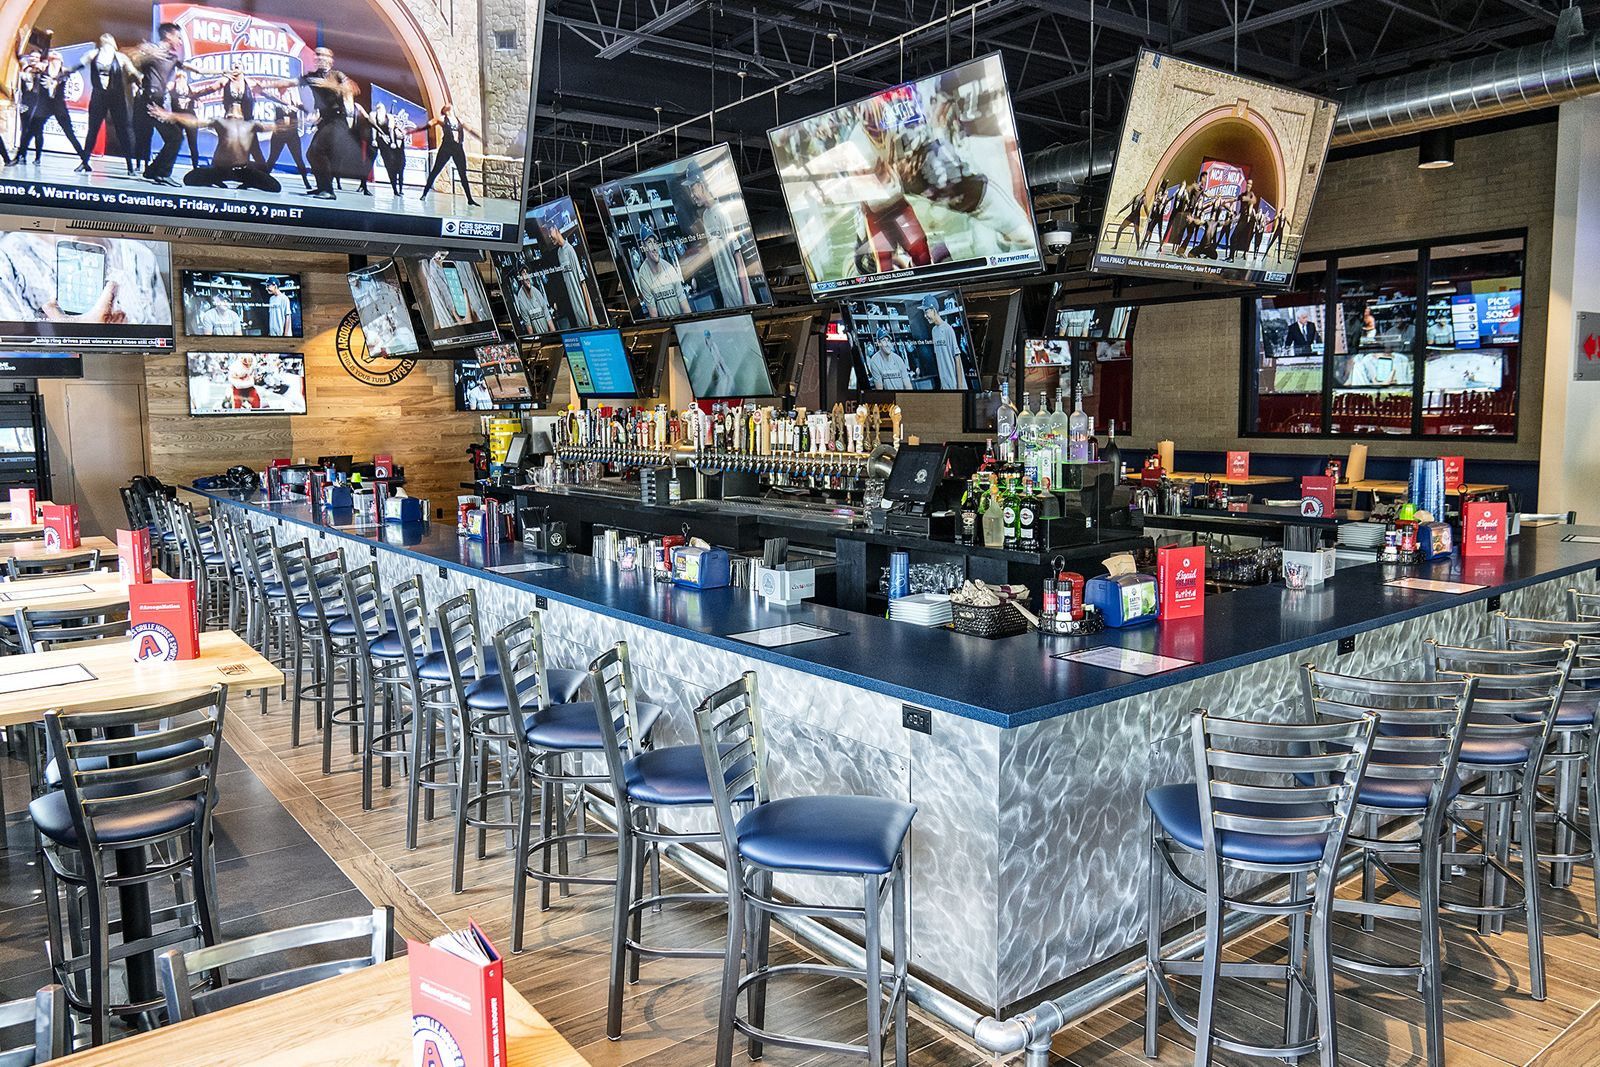 Arooga's Grille House & Sports Bar Named to FranServe Fran-Tastic 500